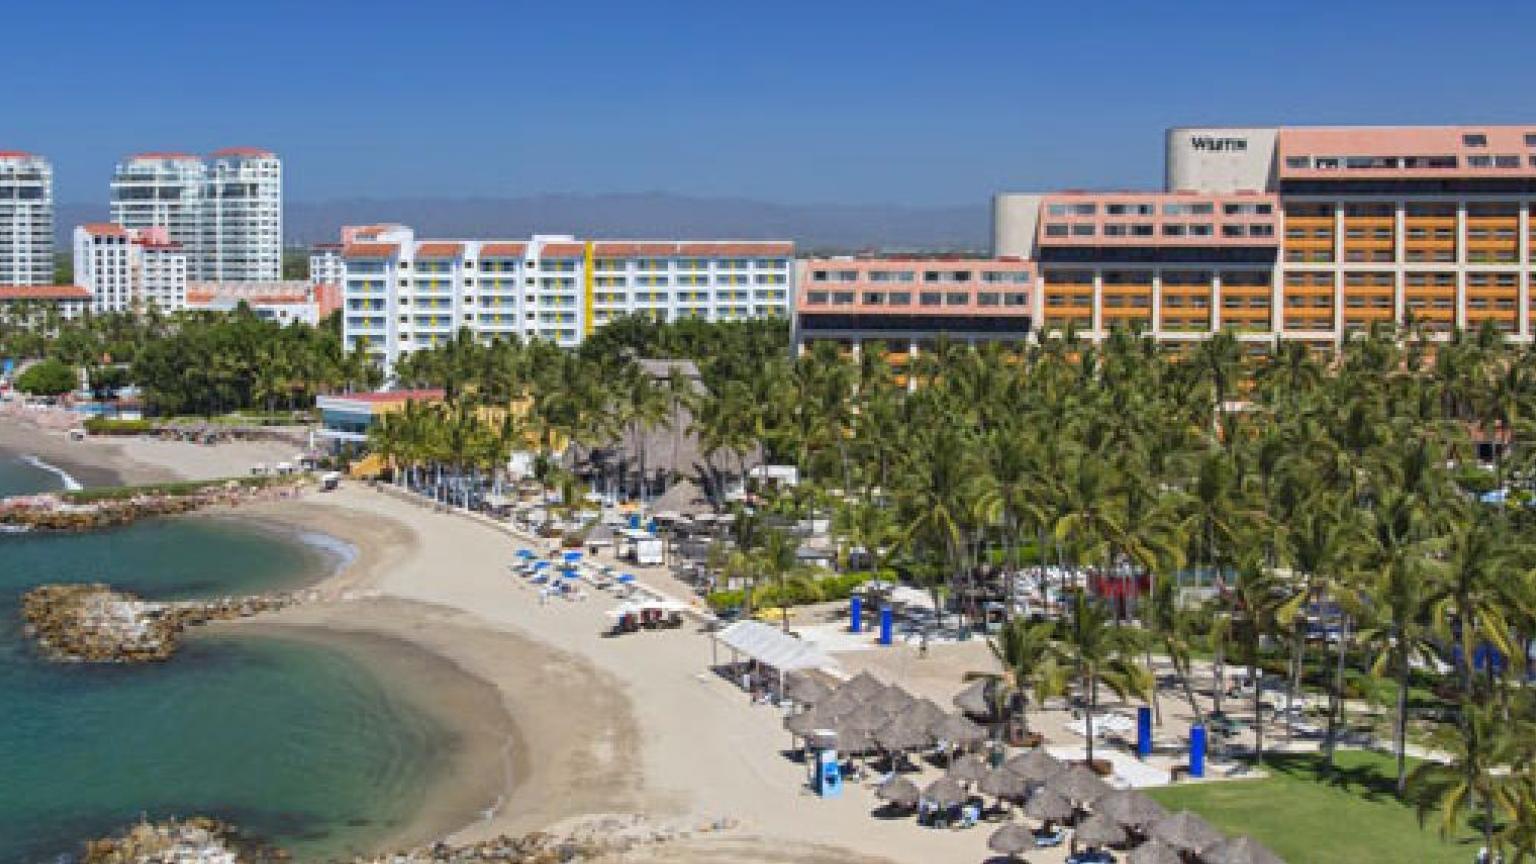 Umich Fall 2020 Calendar Mark Your Calendars Puerto Vallarta 2020 | Anesthesiology